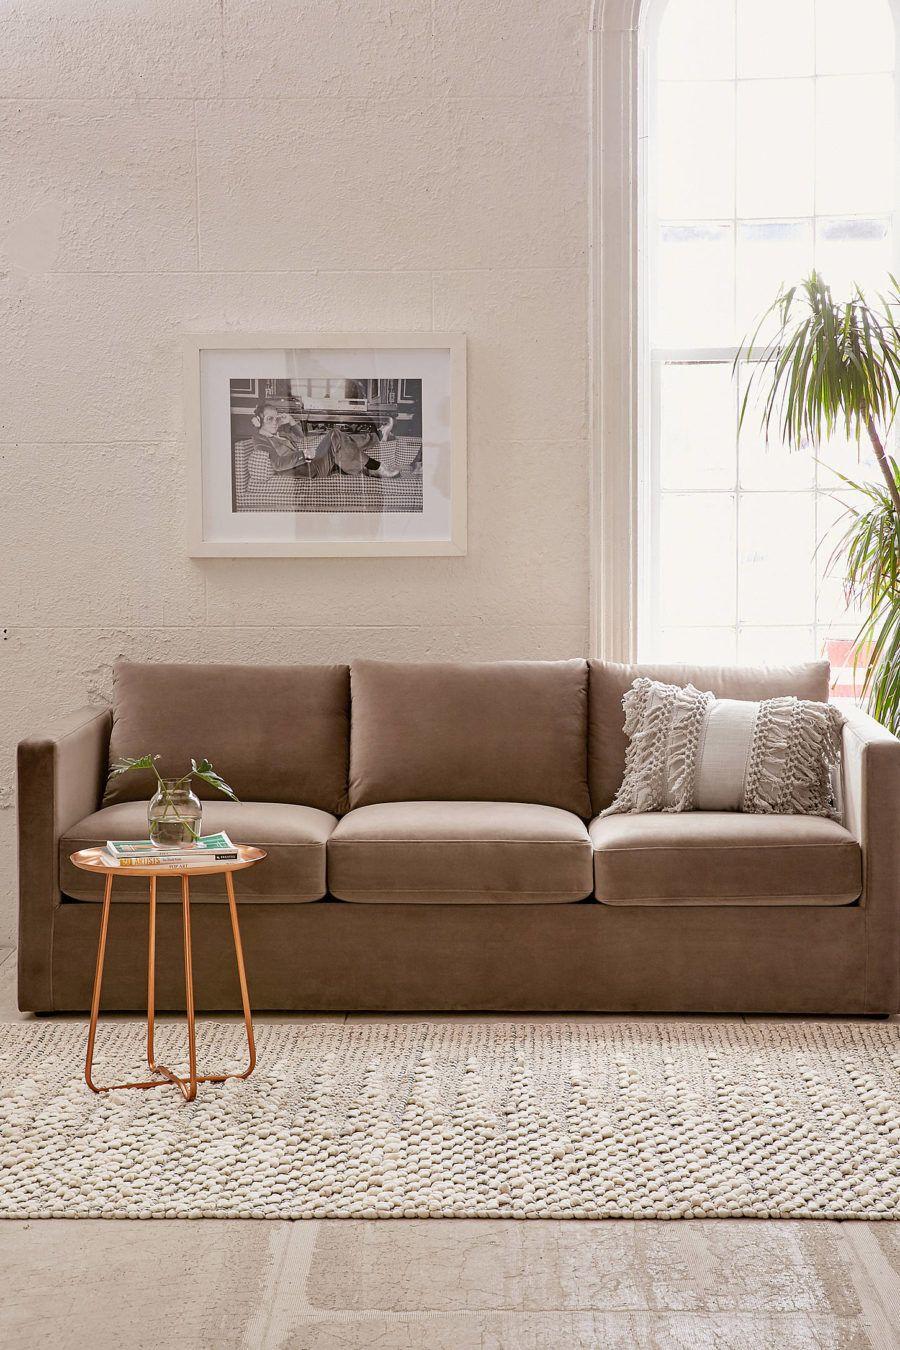 40 velvet sofas that add a bit of sex appeal to the house rh pinterest ca